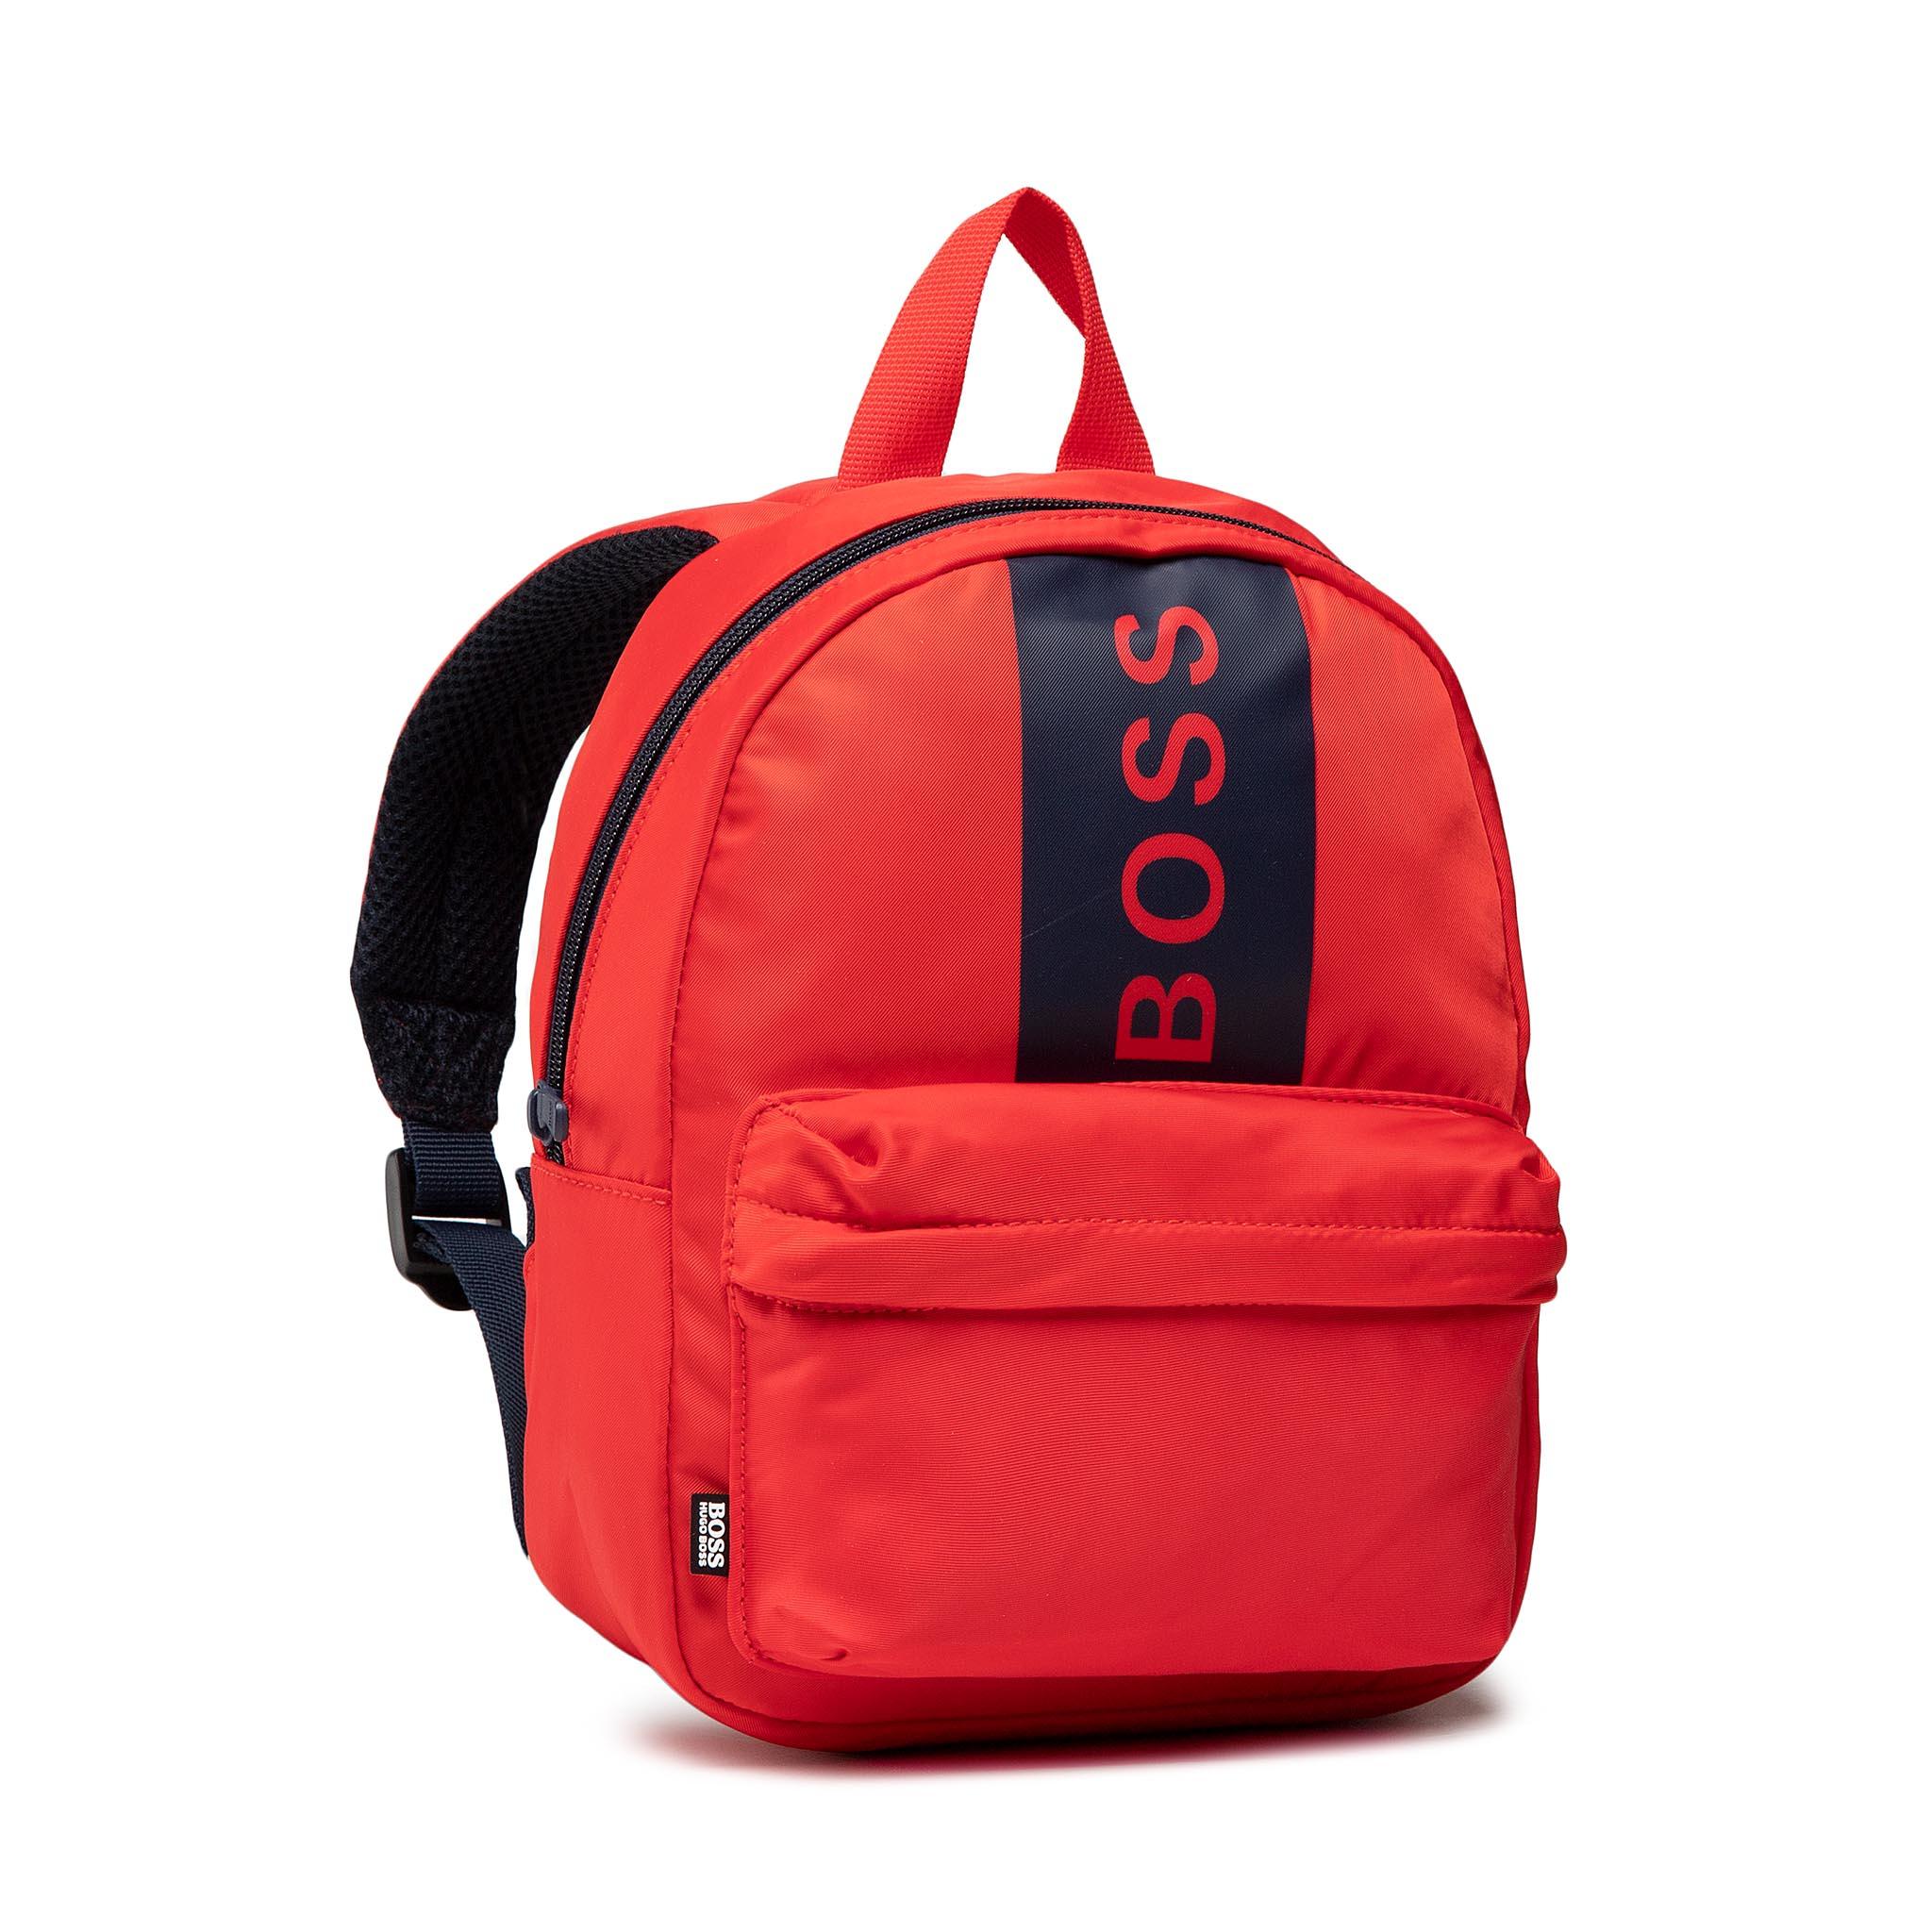 Zaino BOSS - J00097 Red 97E